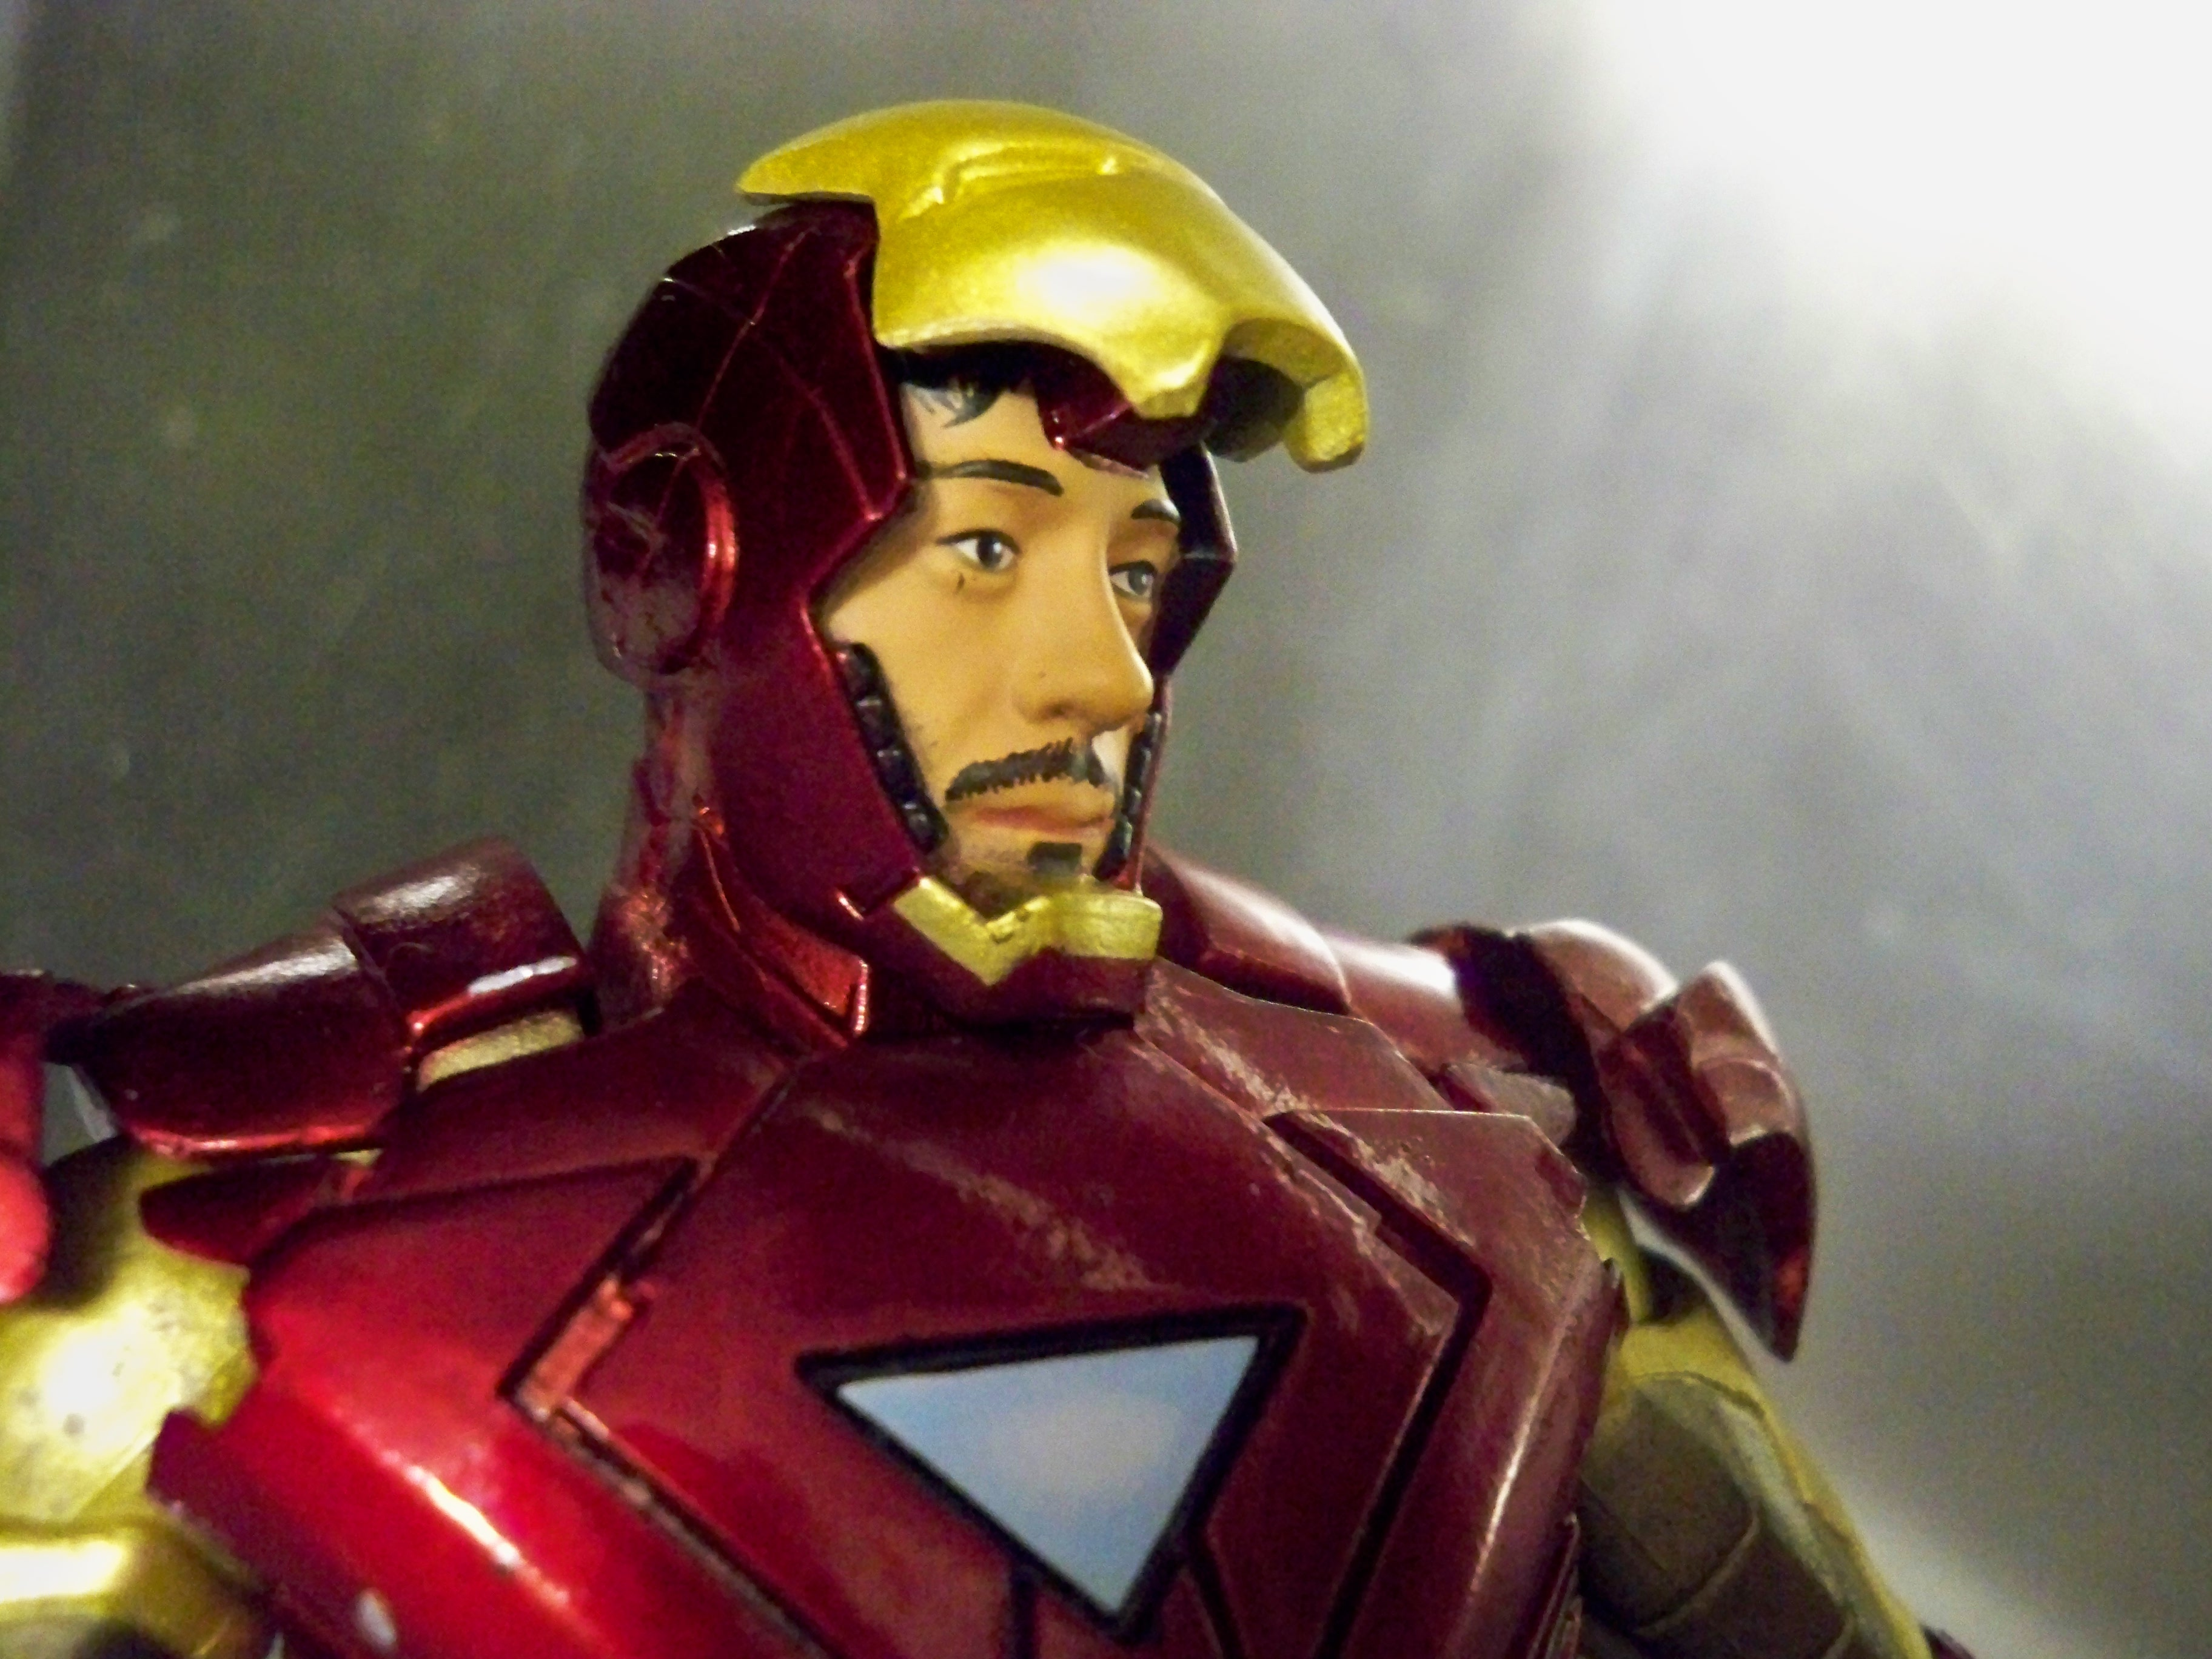 iron man 2 vs bootleg iron man 2 starring